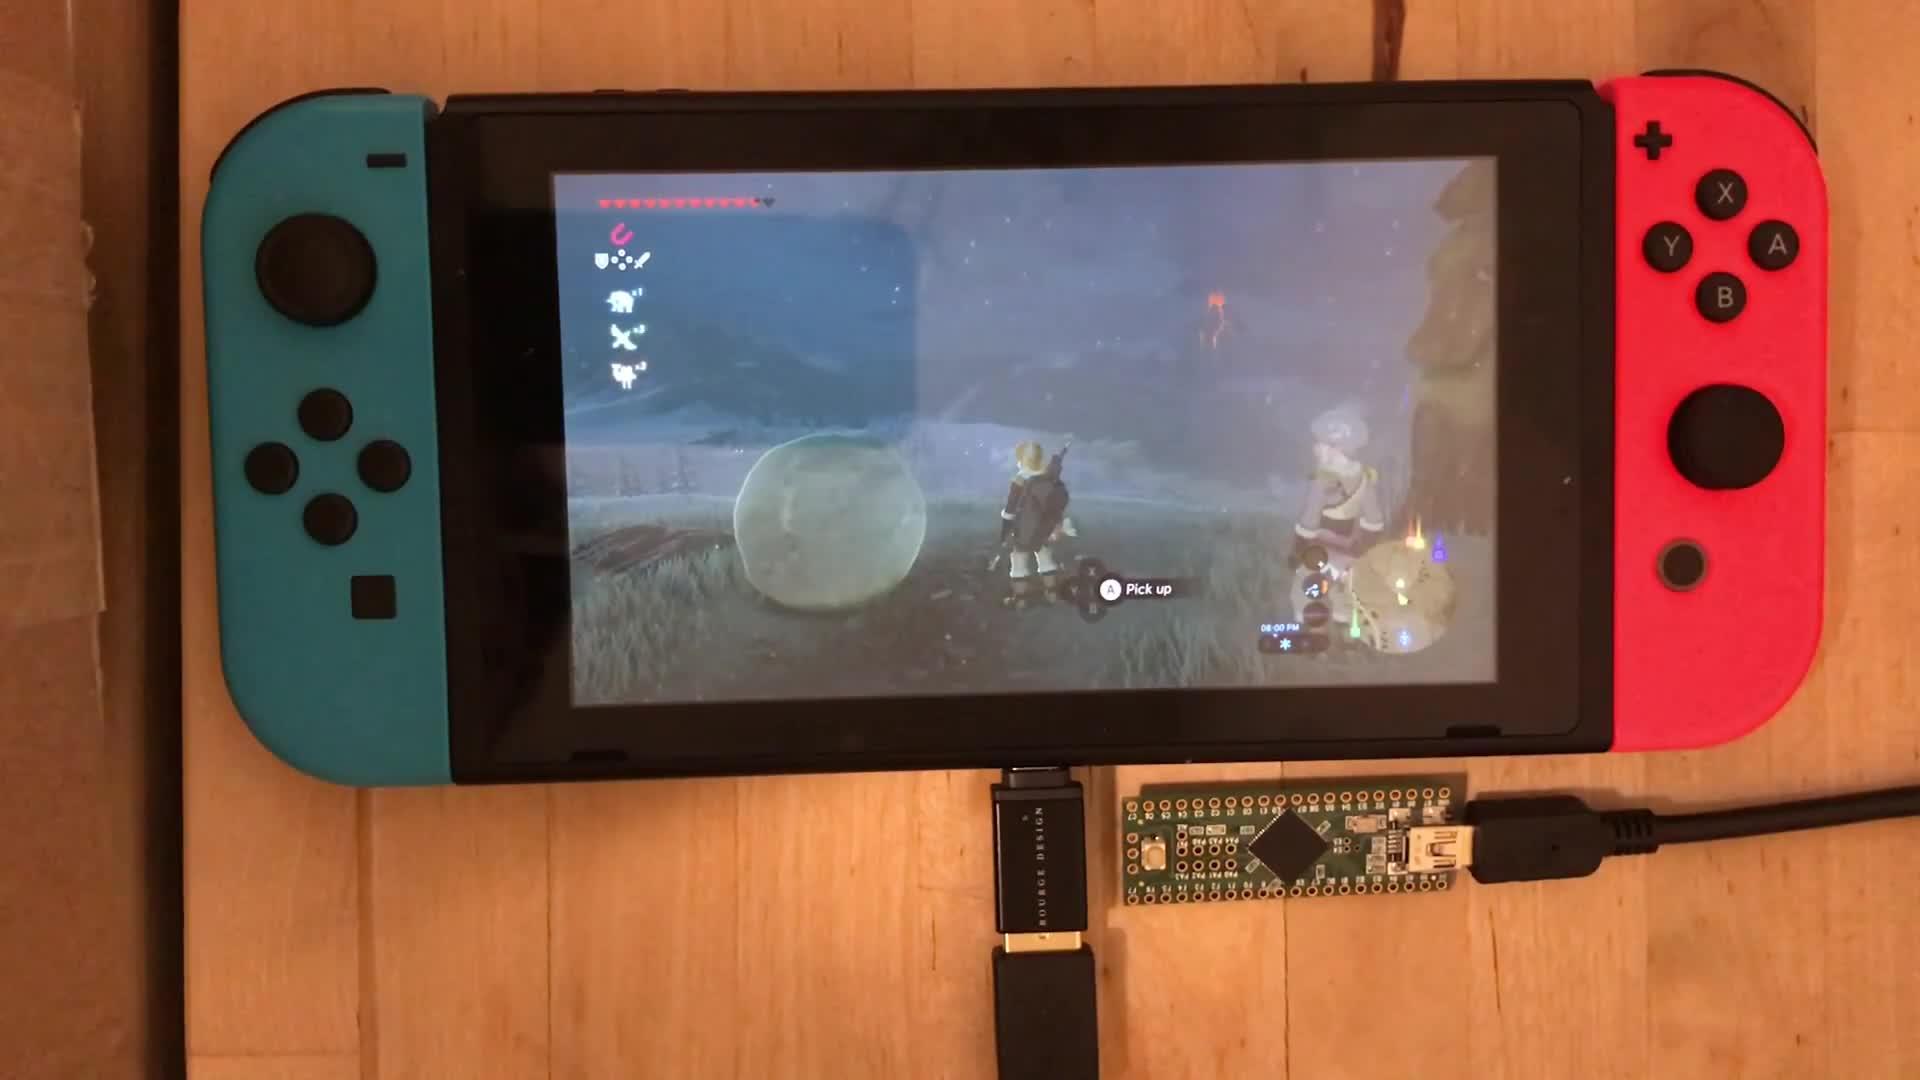 botw zelda breathofthewild switch automation script, Automated Bowling in Zelda GIFs